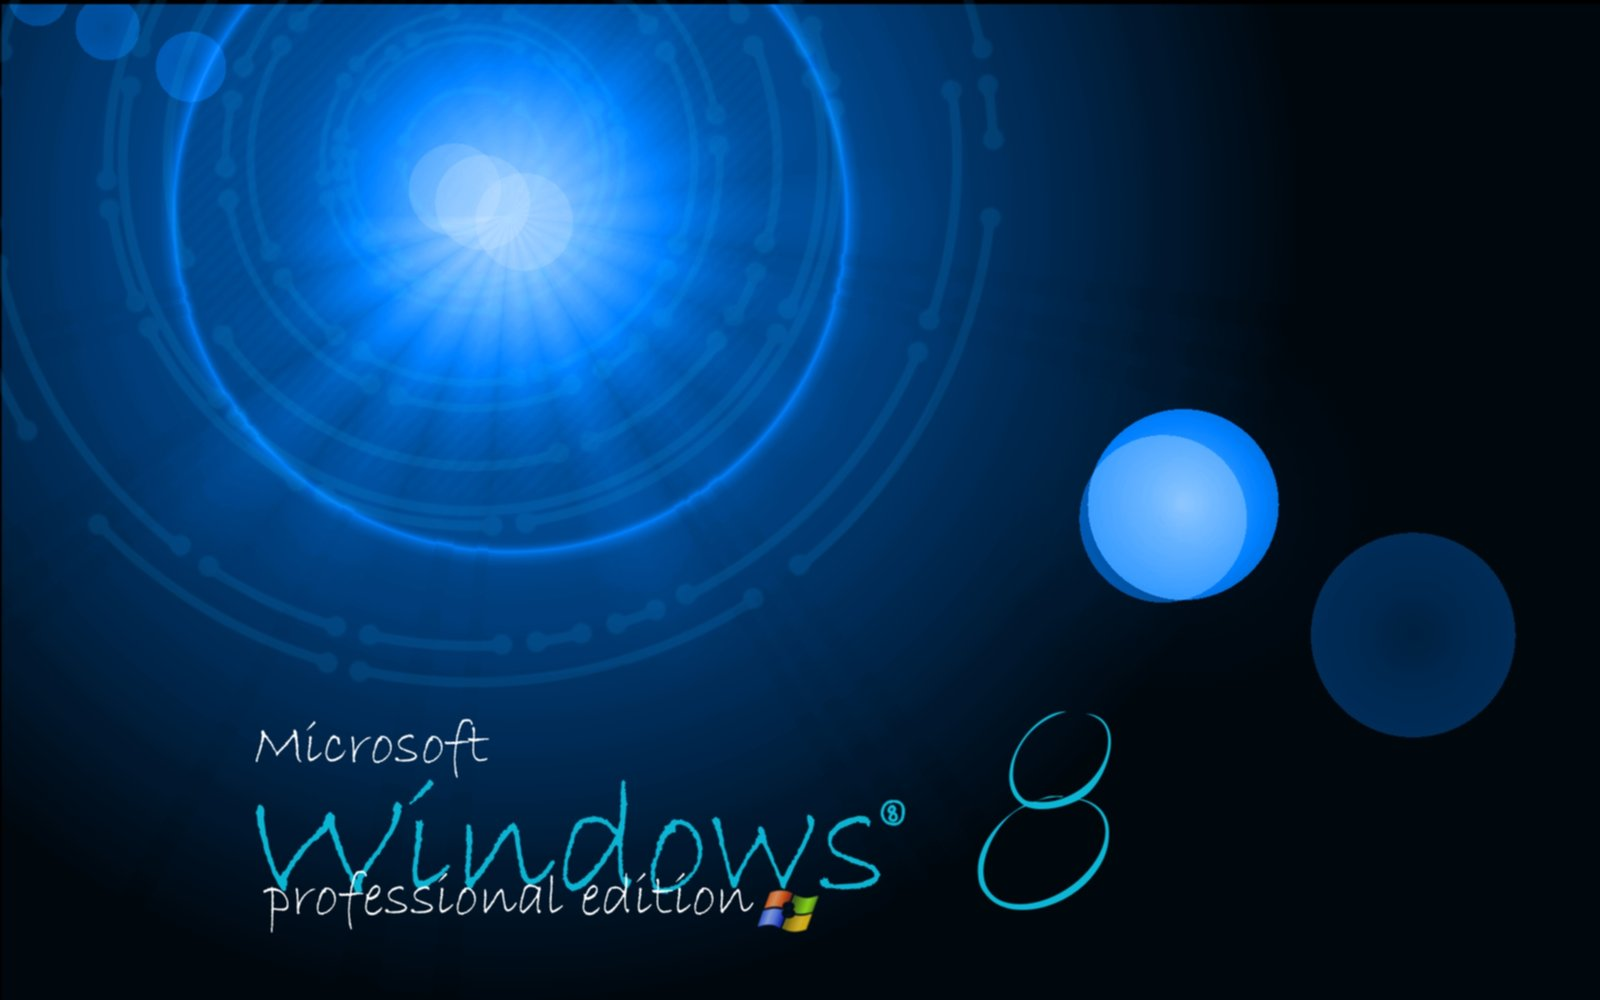 Wallpapers HD: Windows 8 - Wallpapers 37 (Fondos de ...